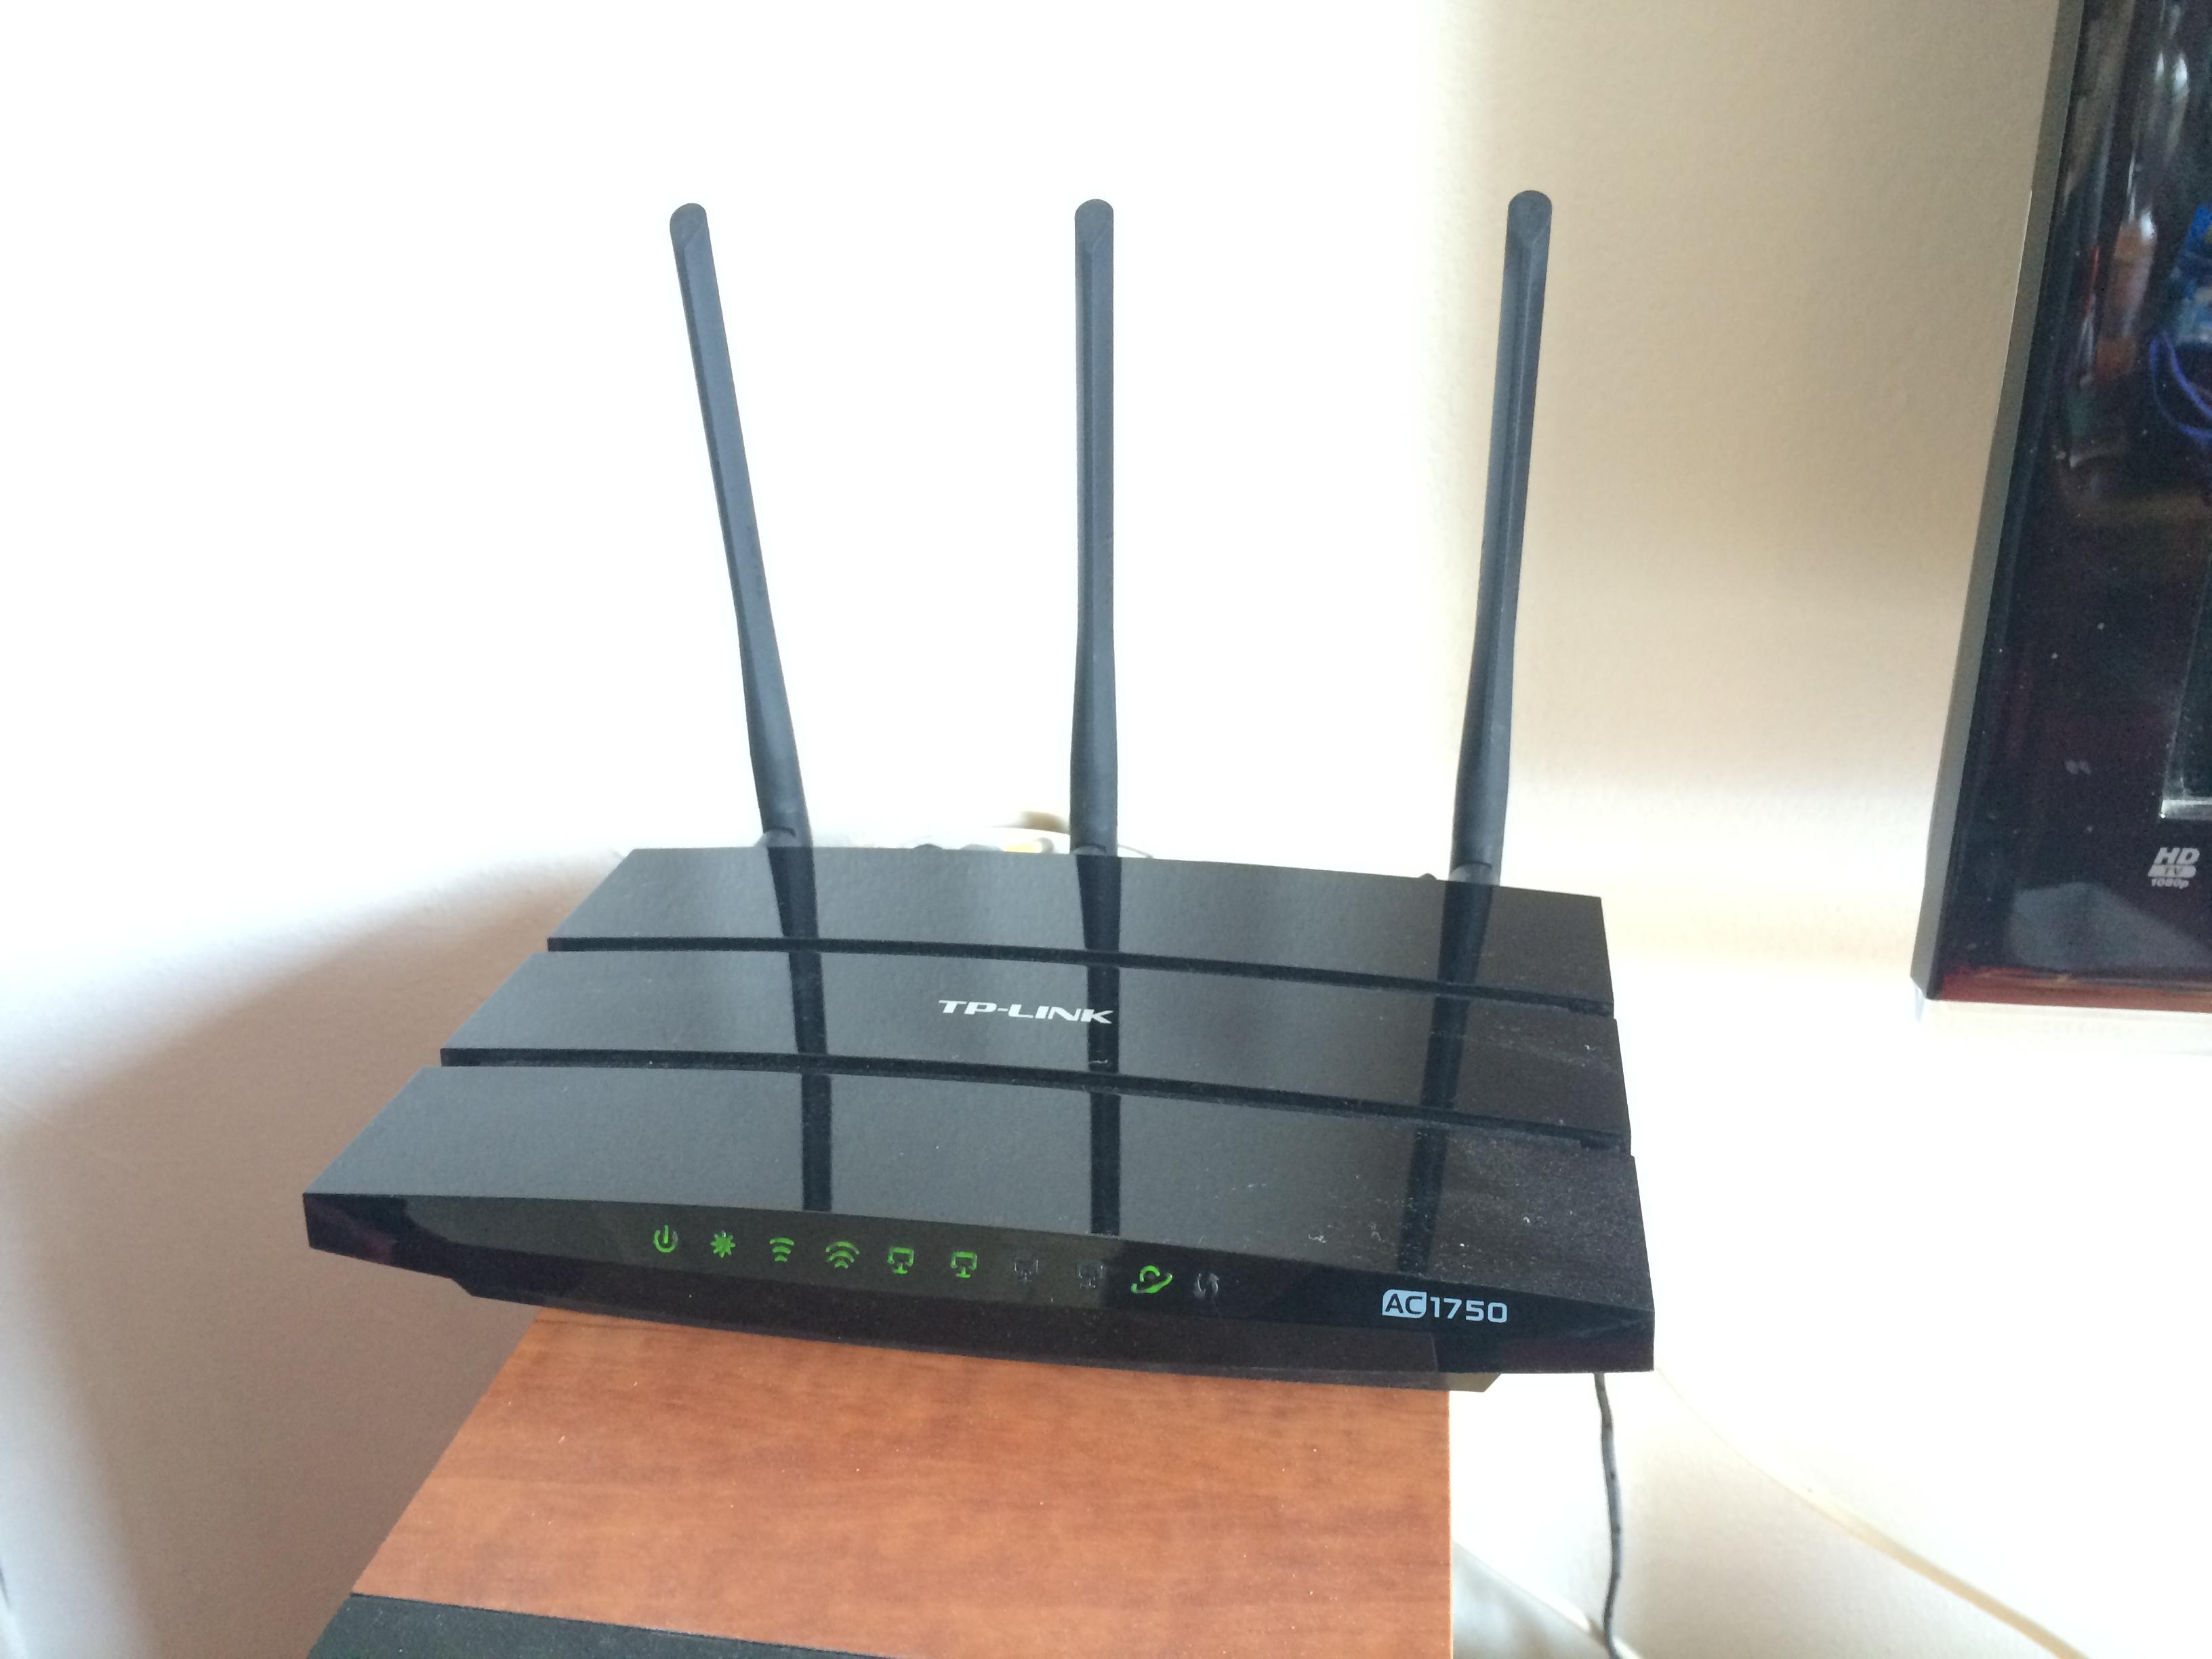 TP-Link AC1750 Draadloze dual-band gigabit router Archer C7